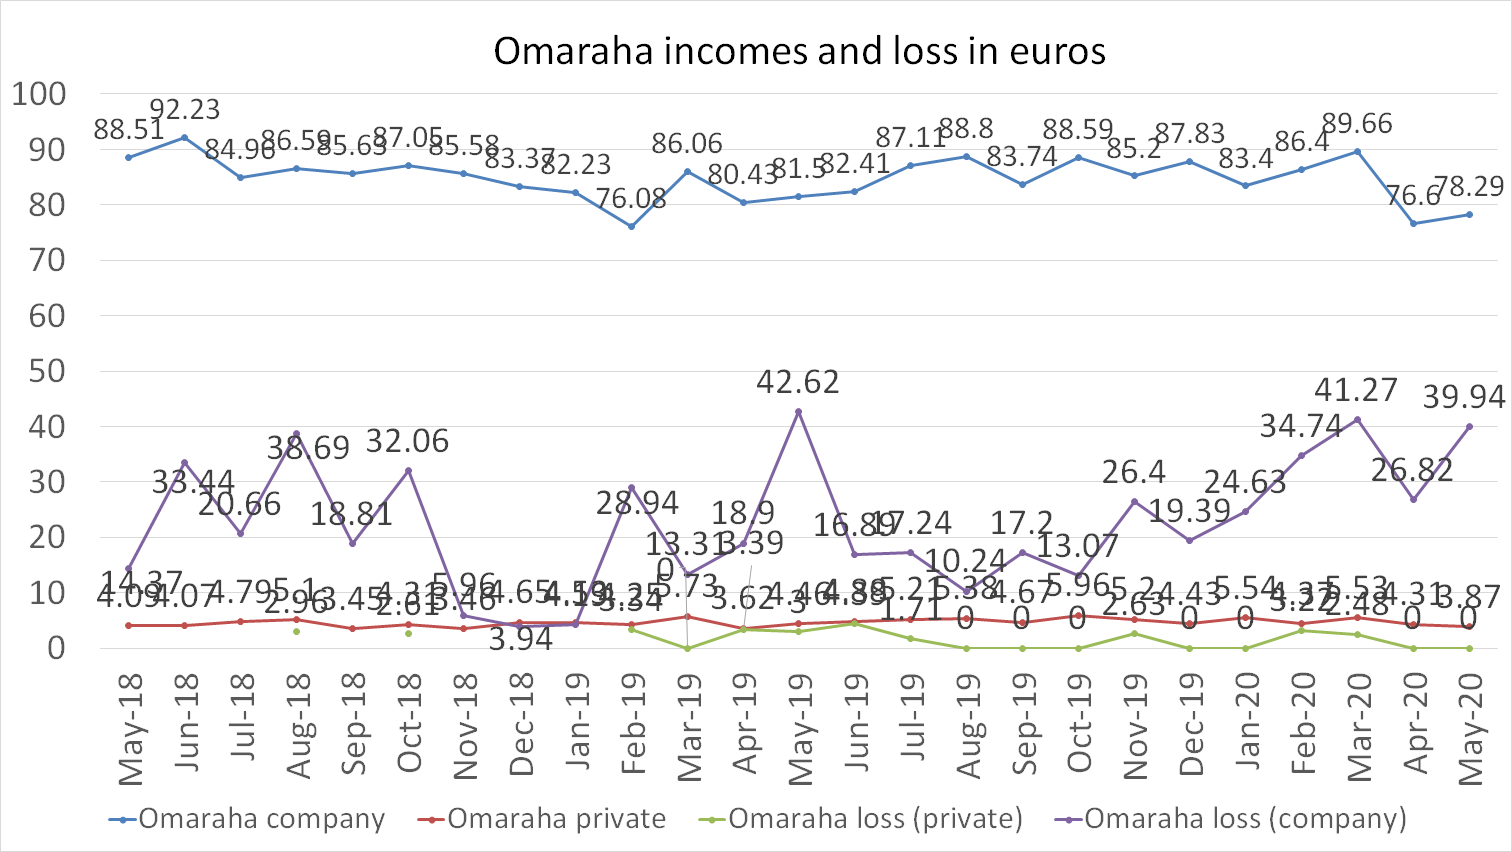 Omaraha income and loss in euros may 2020